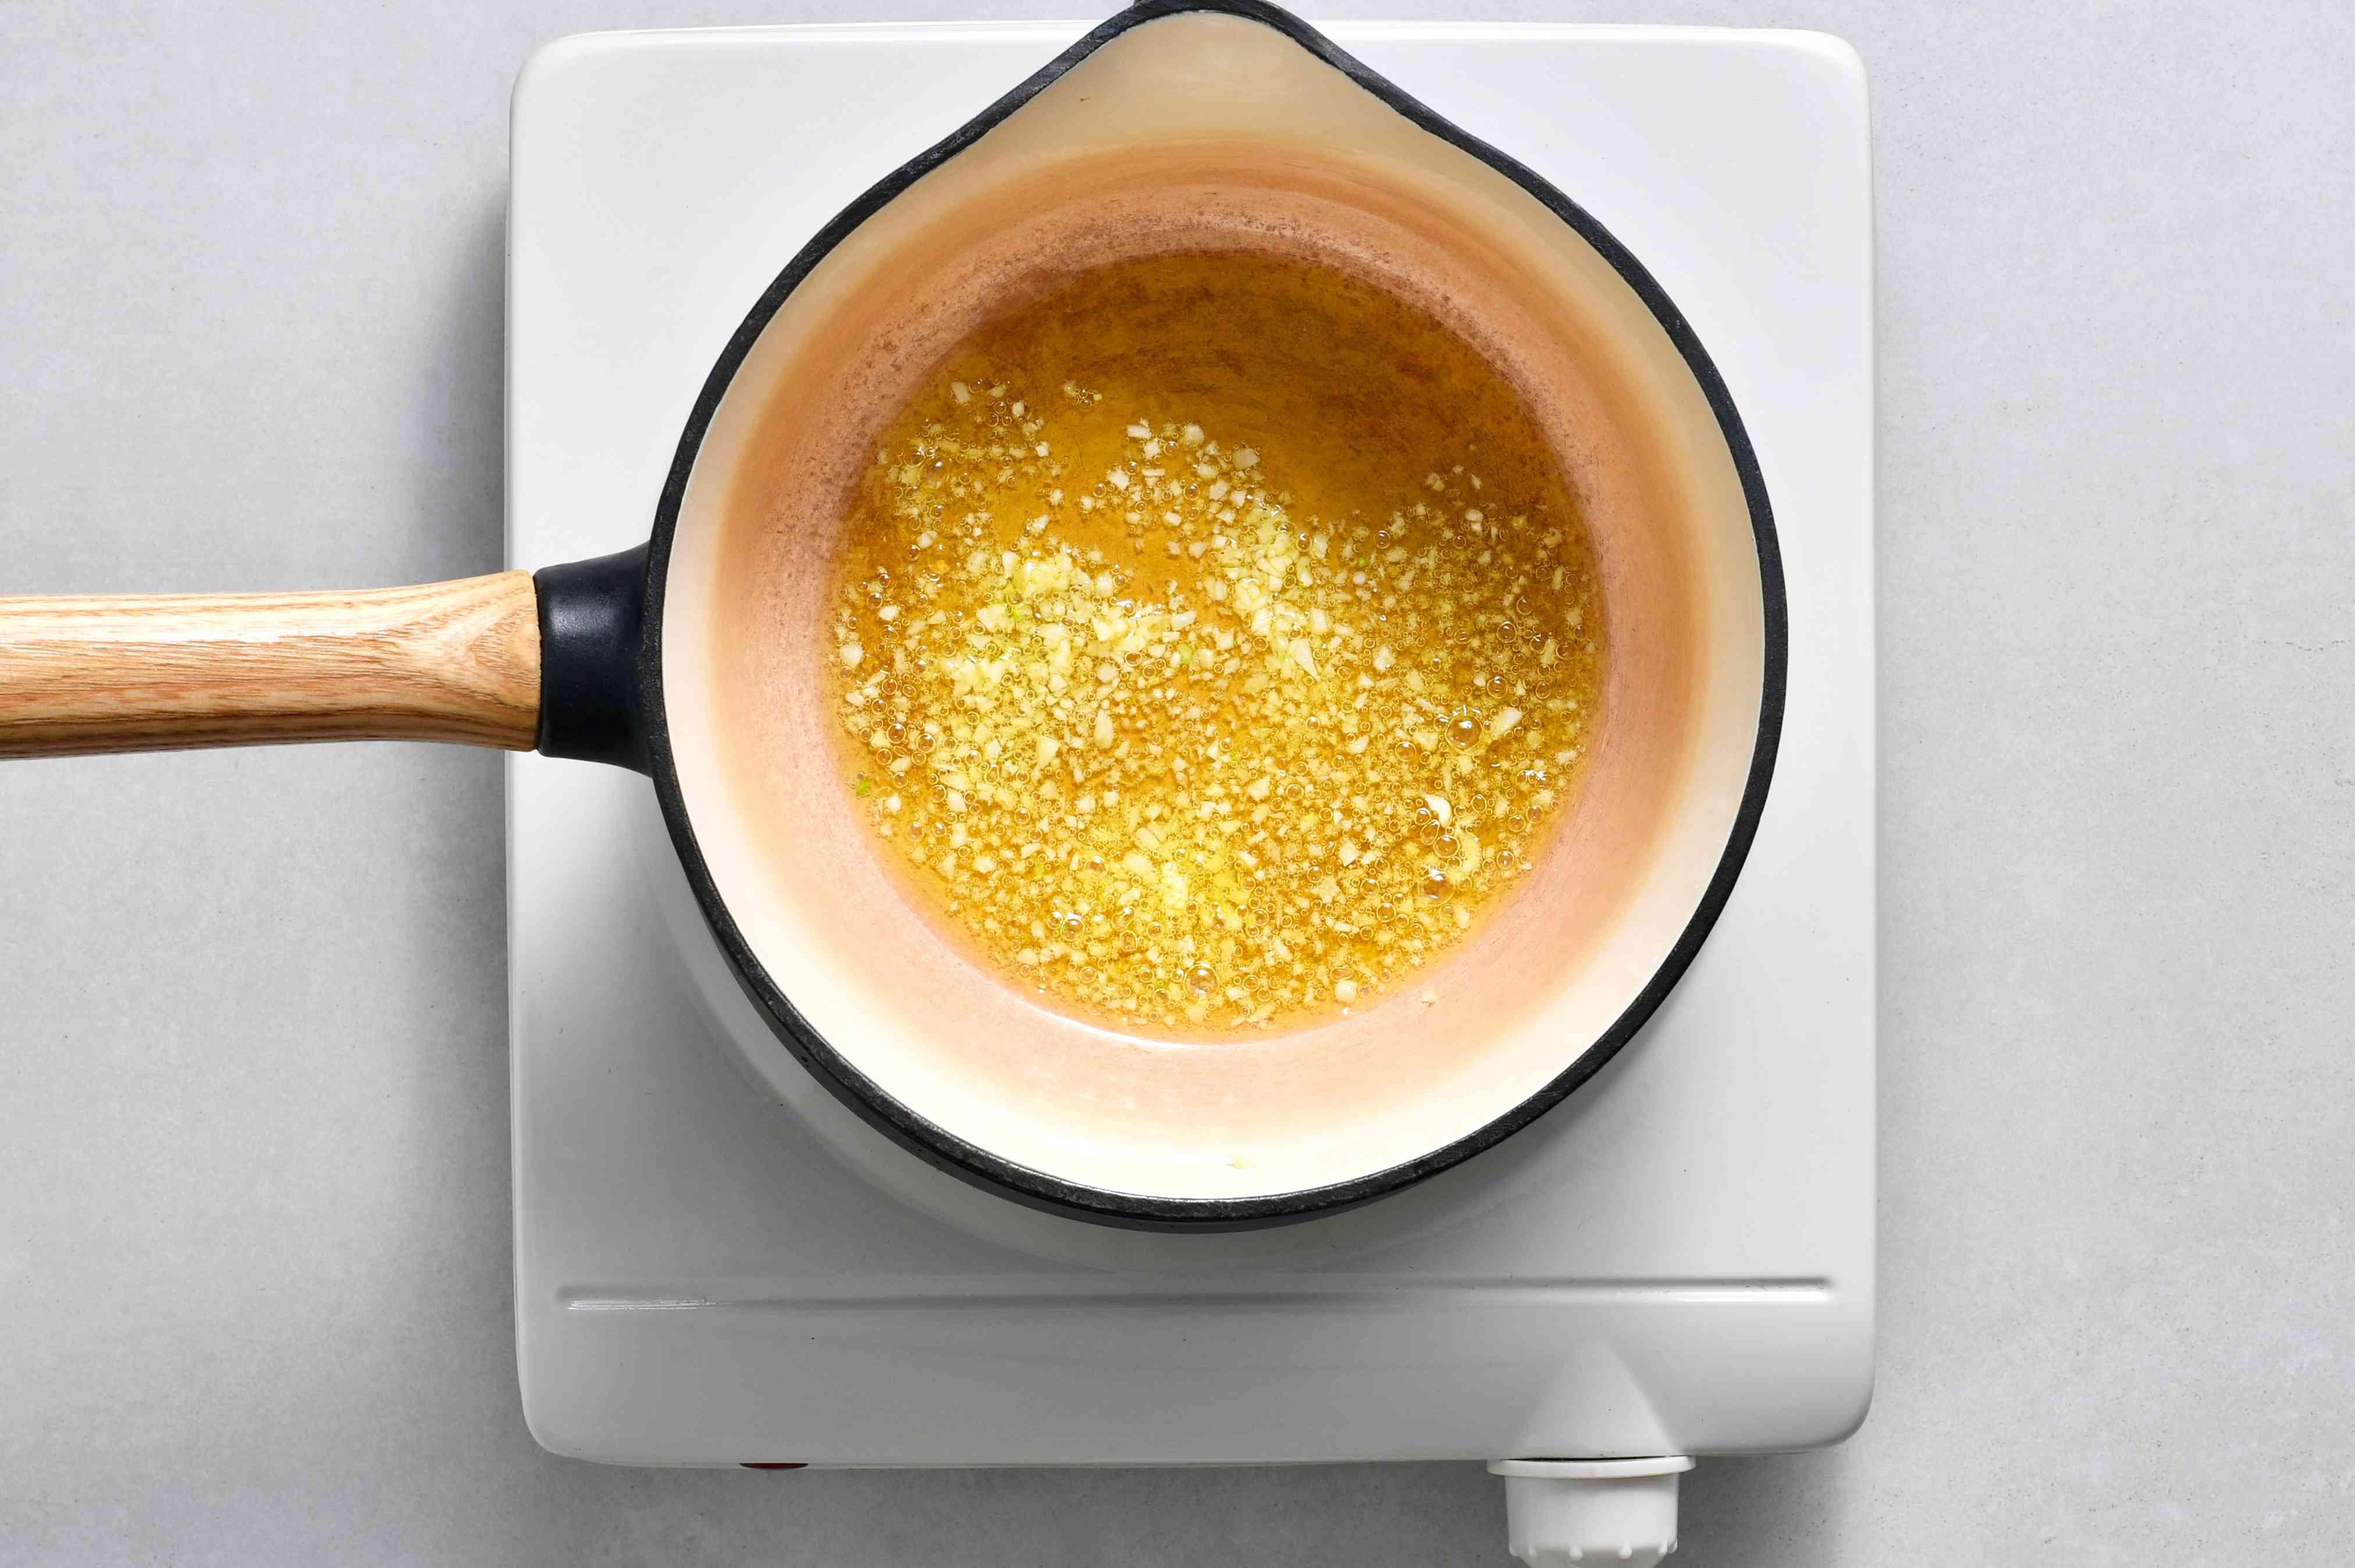 garlic and oil in a saucepan